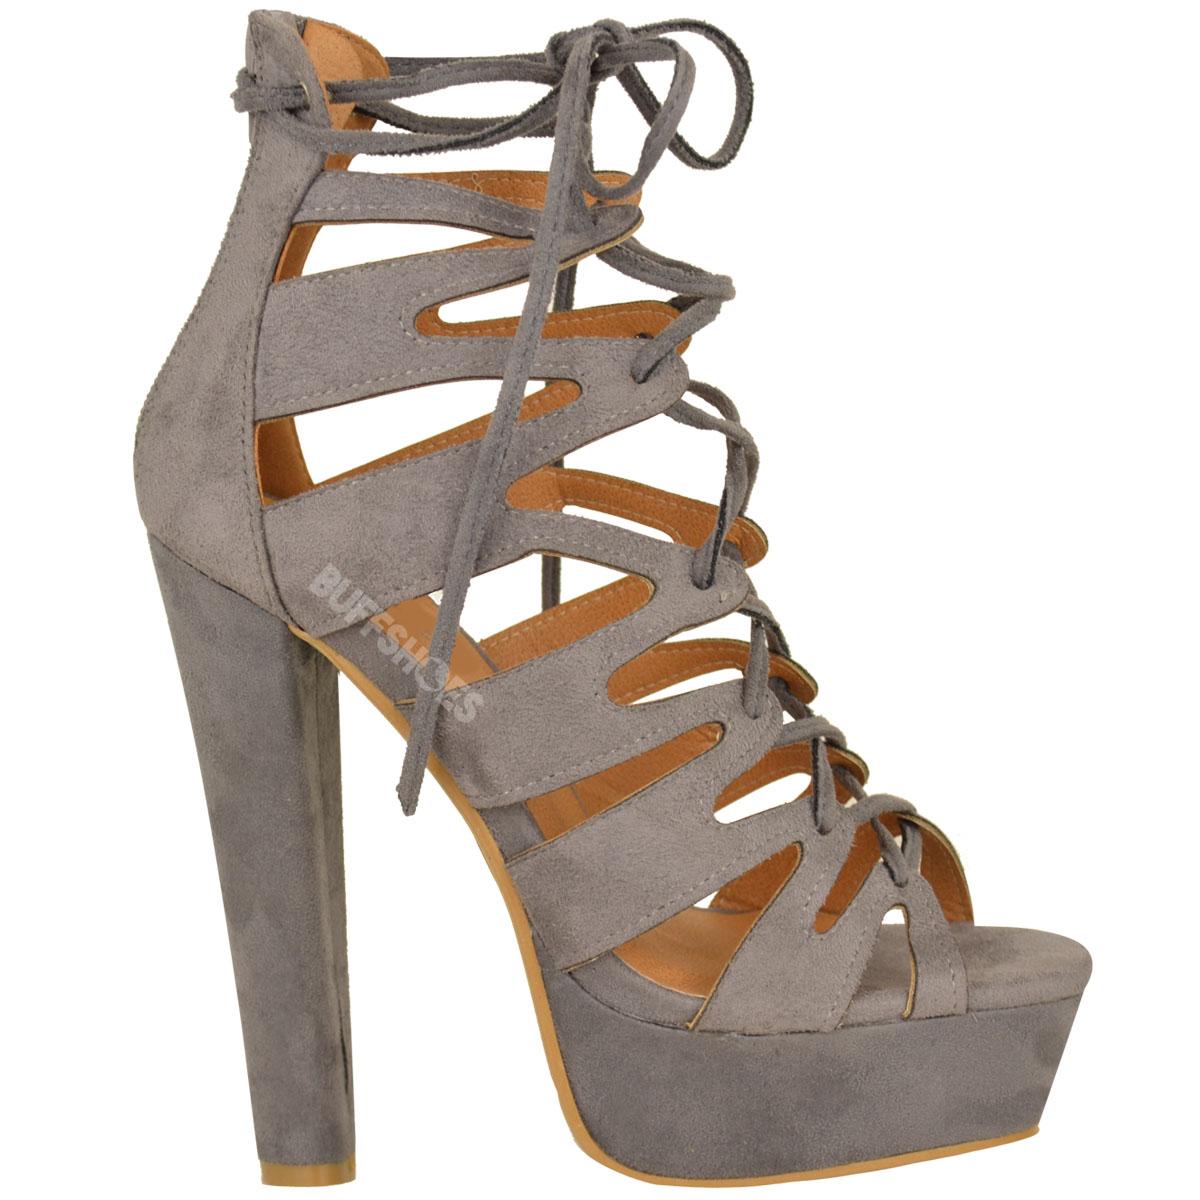 New Womens Ladies High Heel Platform Gladiator Sandals